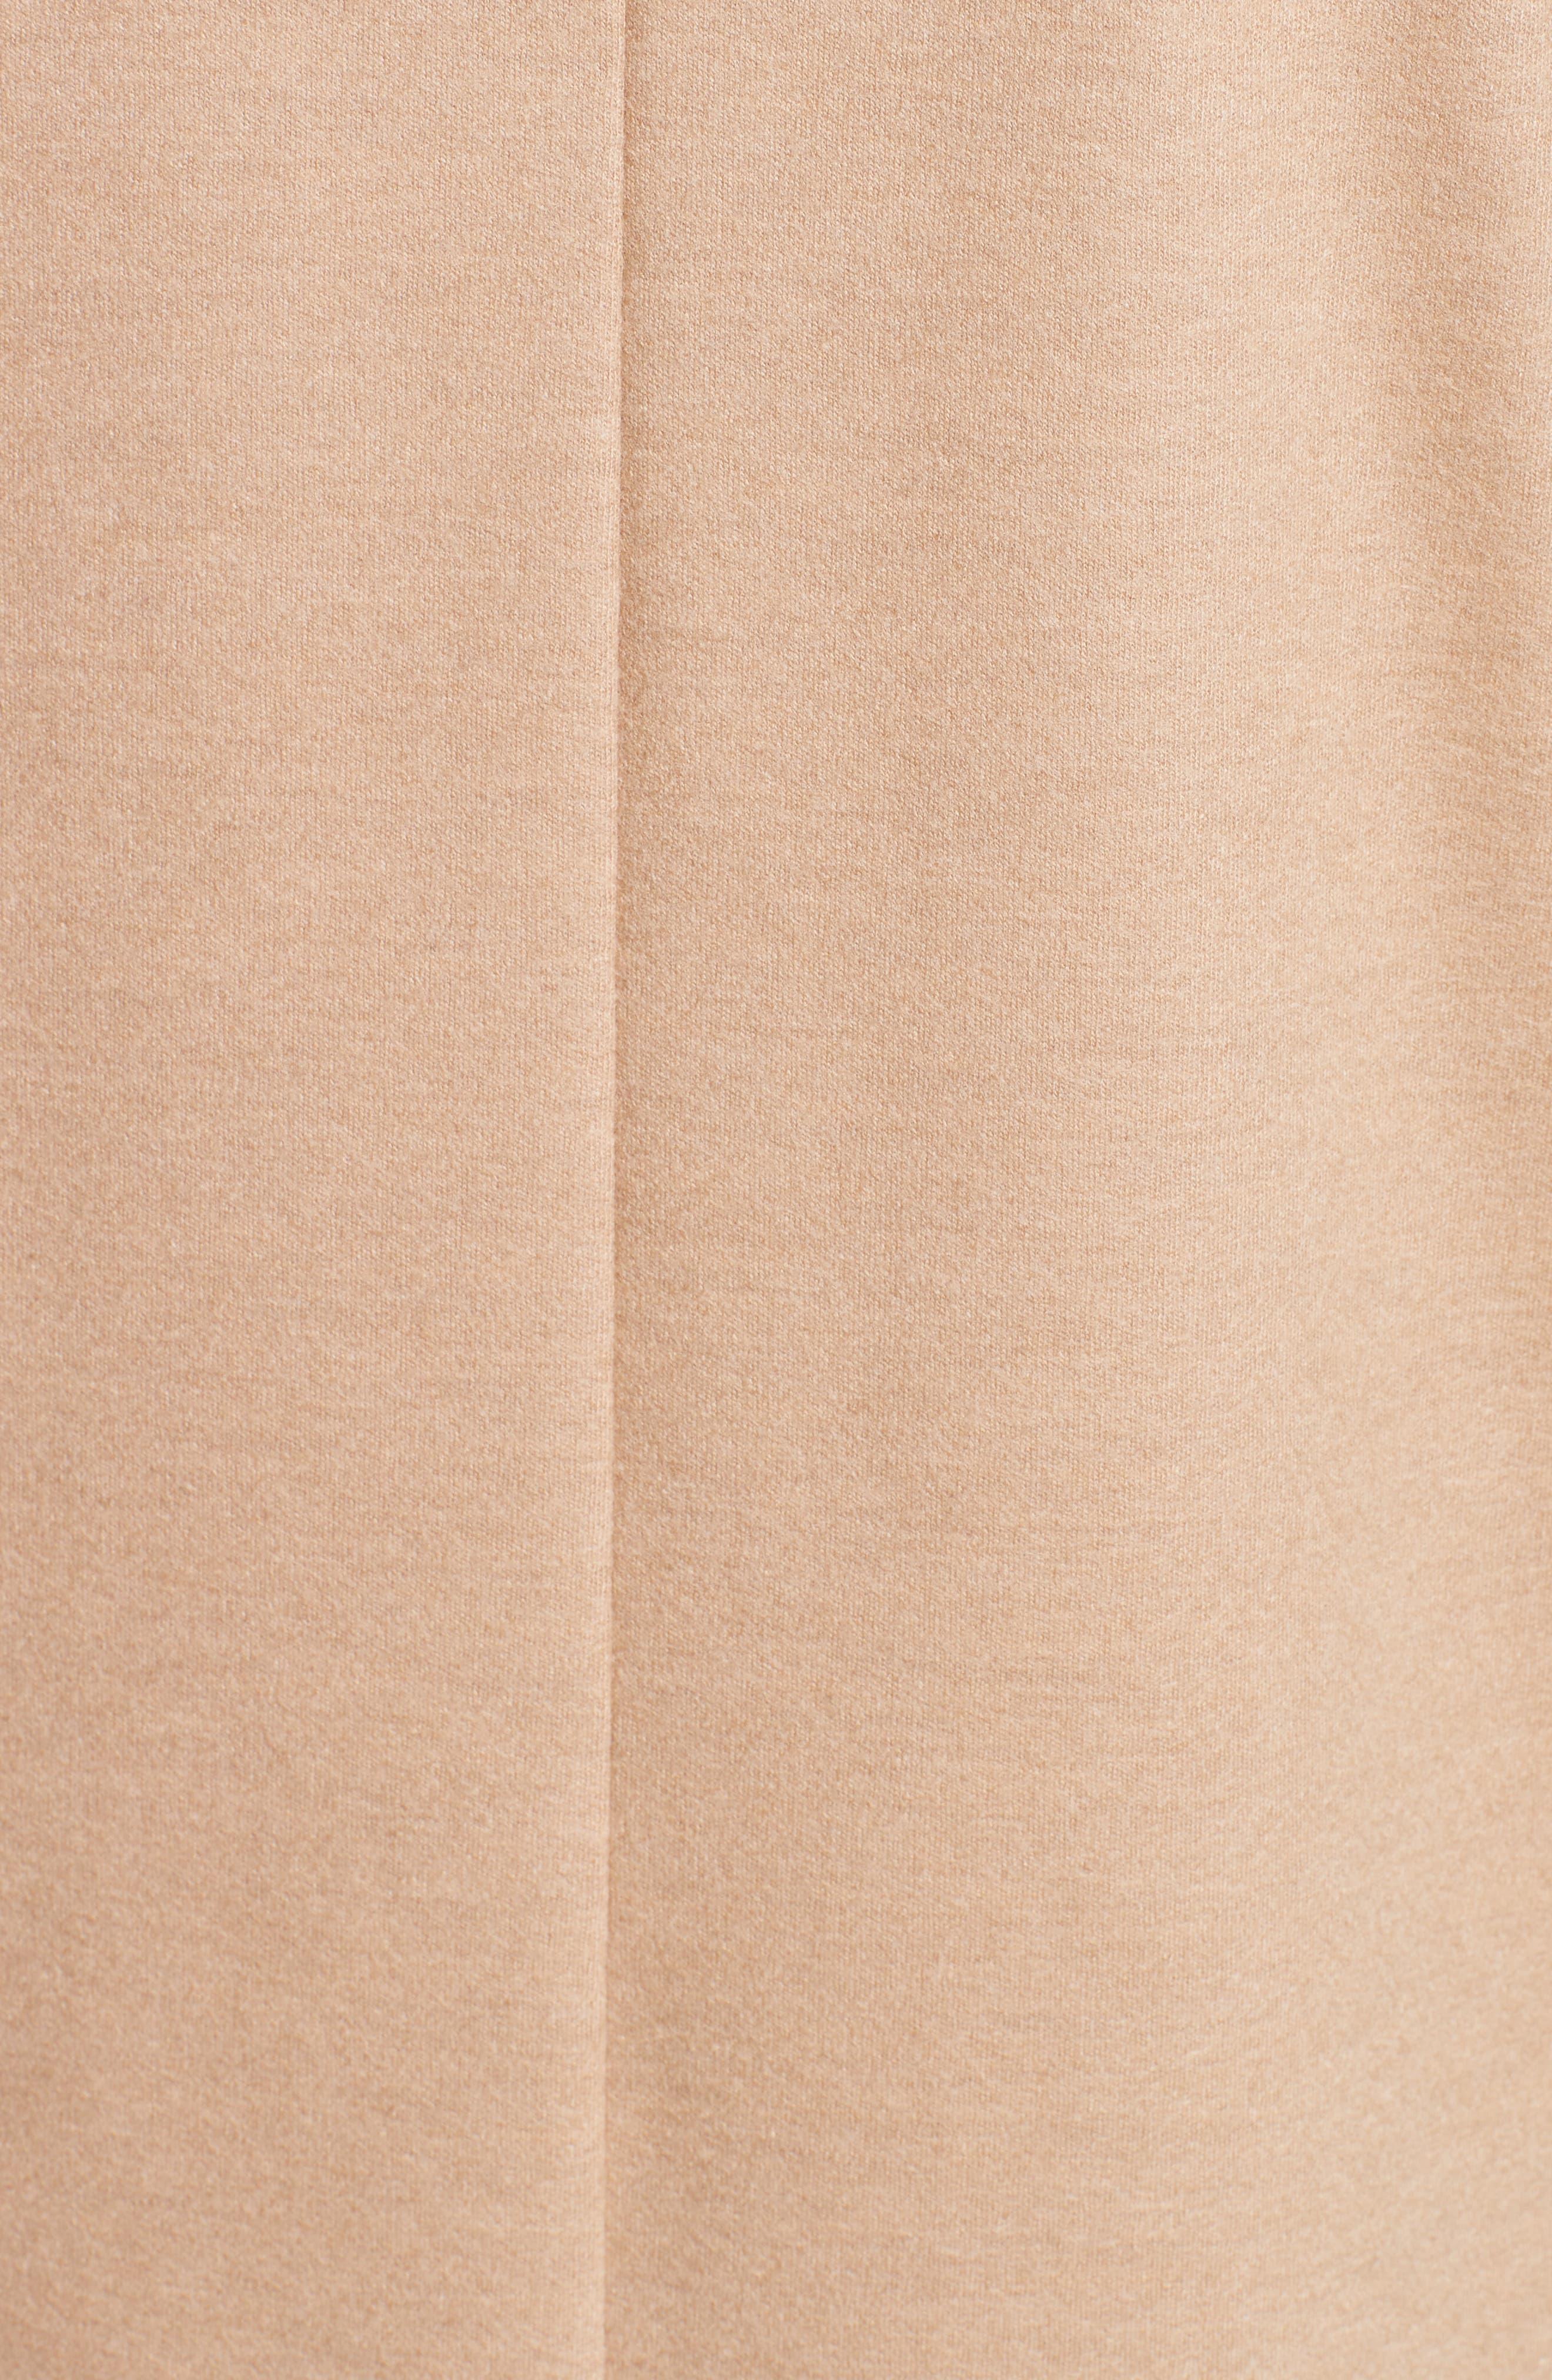 Agro Wool Turtleneck Dress,                             Alternate thumbnail 5, color,                             232